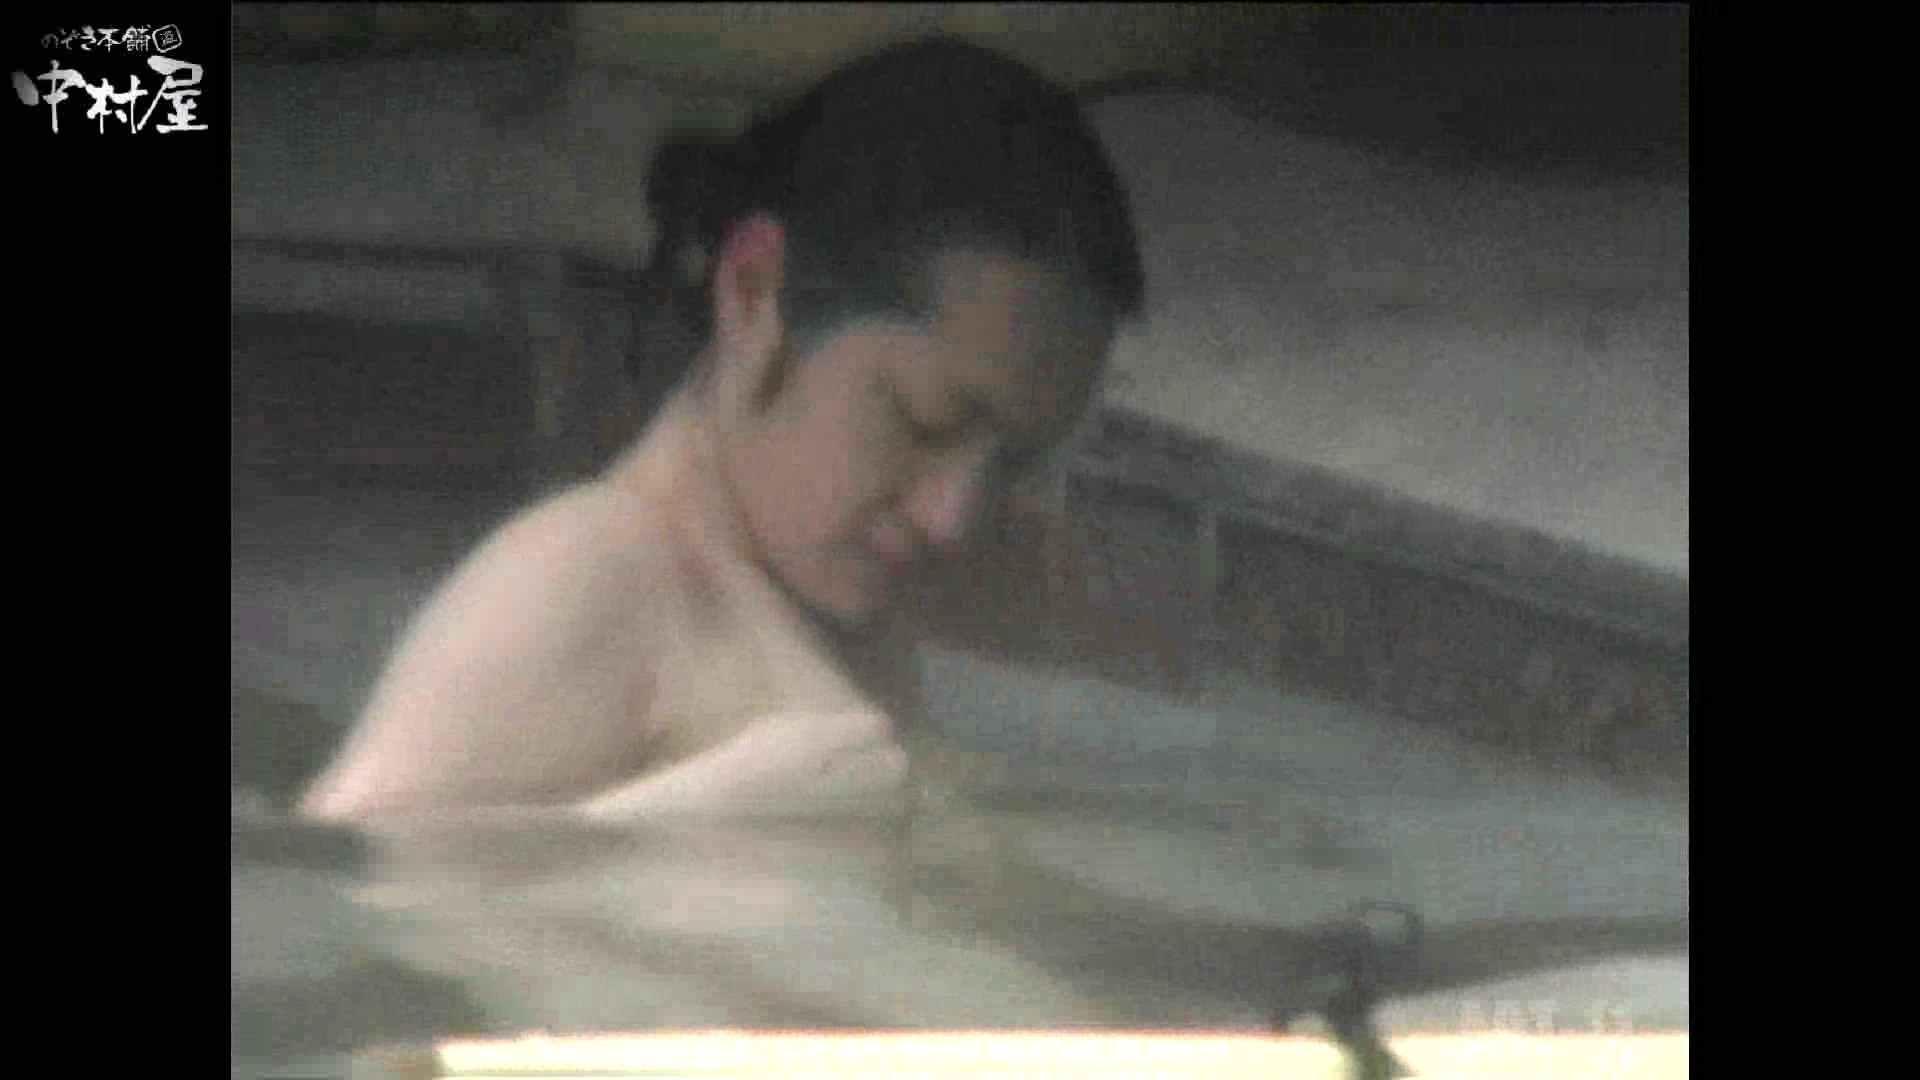 Aquaな露天風呂Vol.875潜入盗撮露天風呂十一判湯 其の五 美しいOLの裸体 ワレメ無修正動画無料 94pic 10